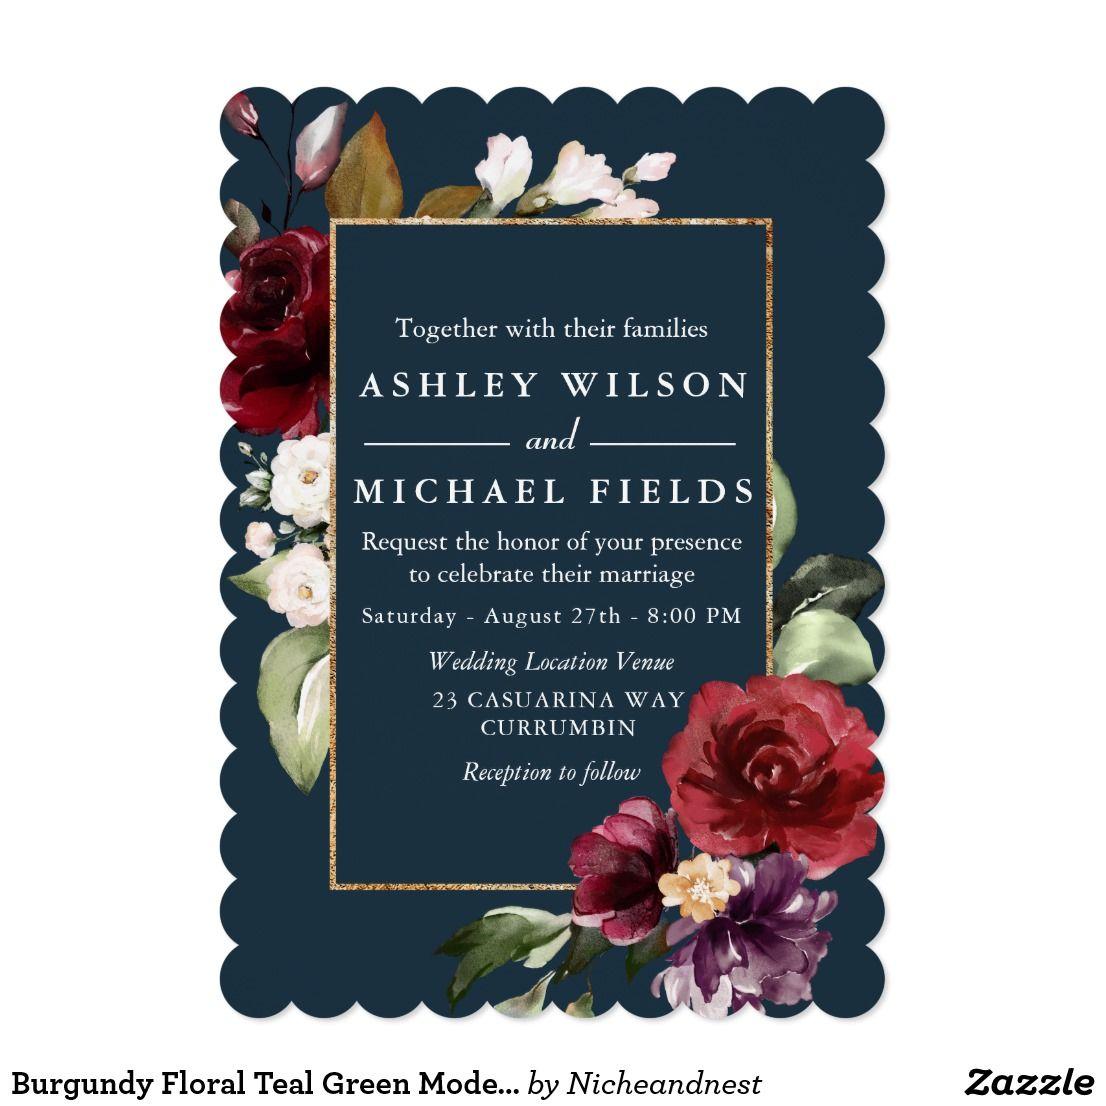 Burgundy Floral Teal Green Modern Wedding Invitation